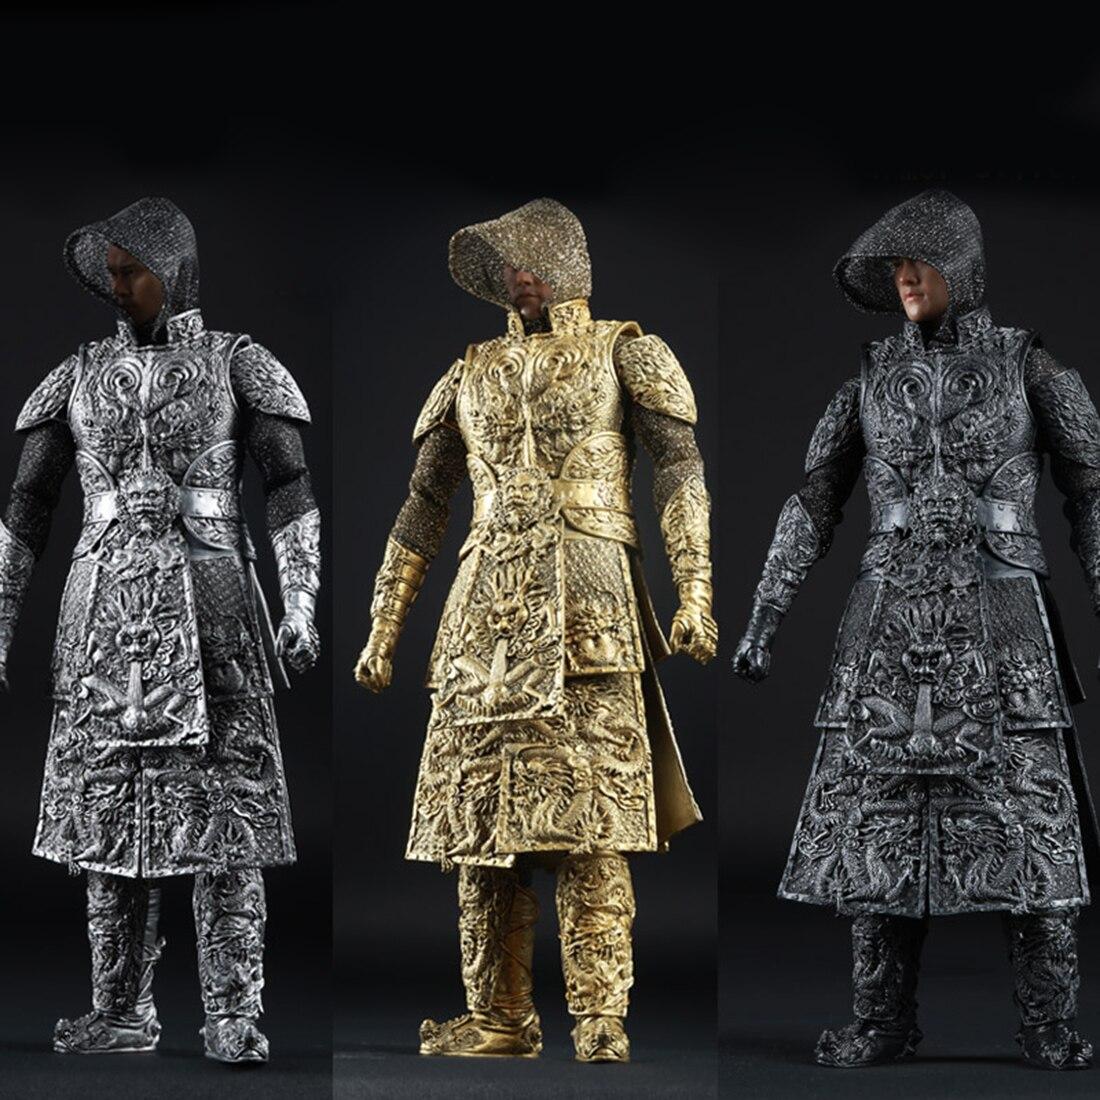 1:6 древний дракон шаблон Armour Barde одежда для 12 Мужской солдат Модель Фигурки Игрушка аксессуар серебро